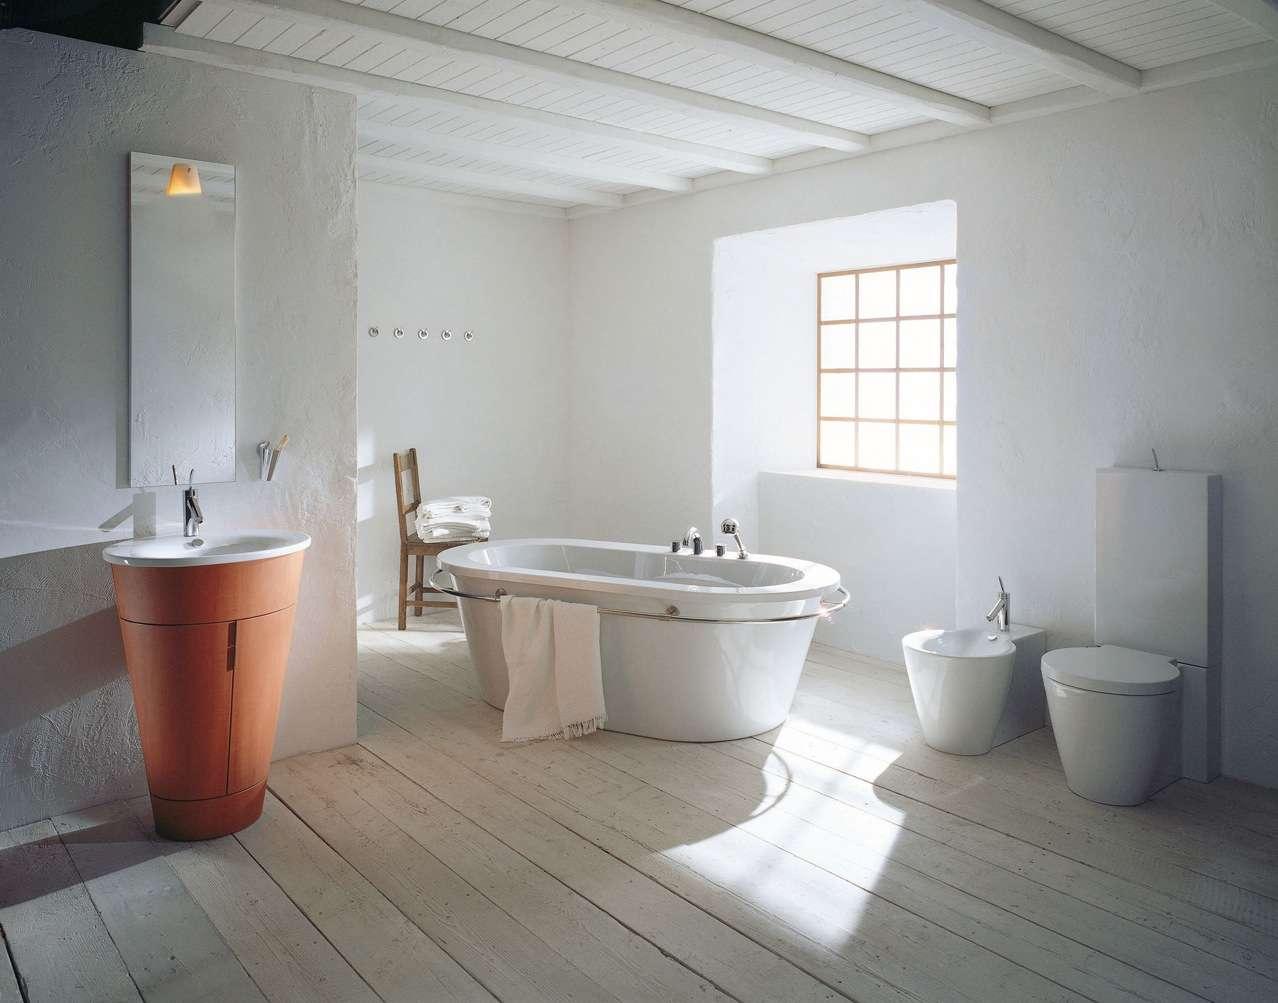 Philipe-Starck-rustic-modern-bathroom-decor